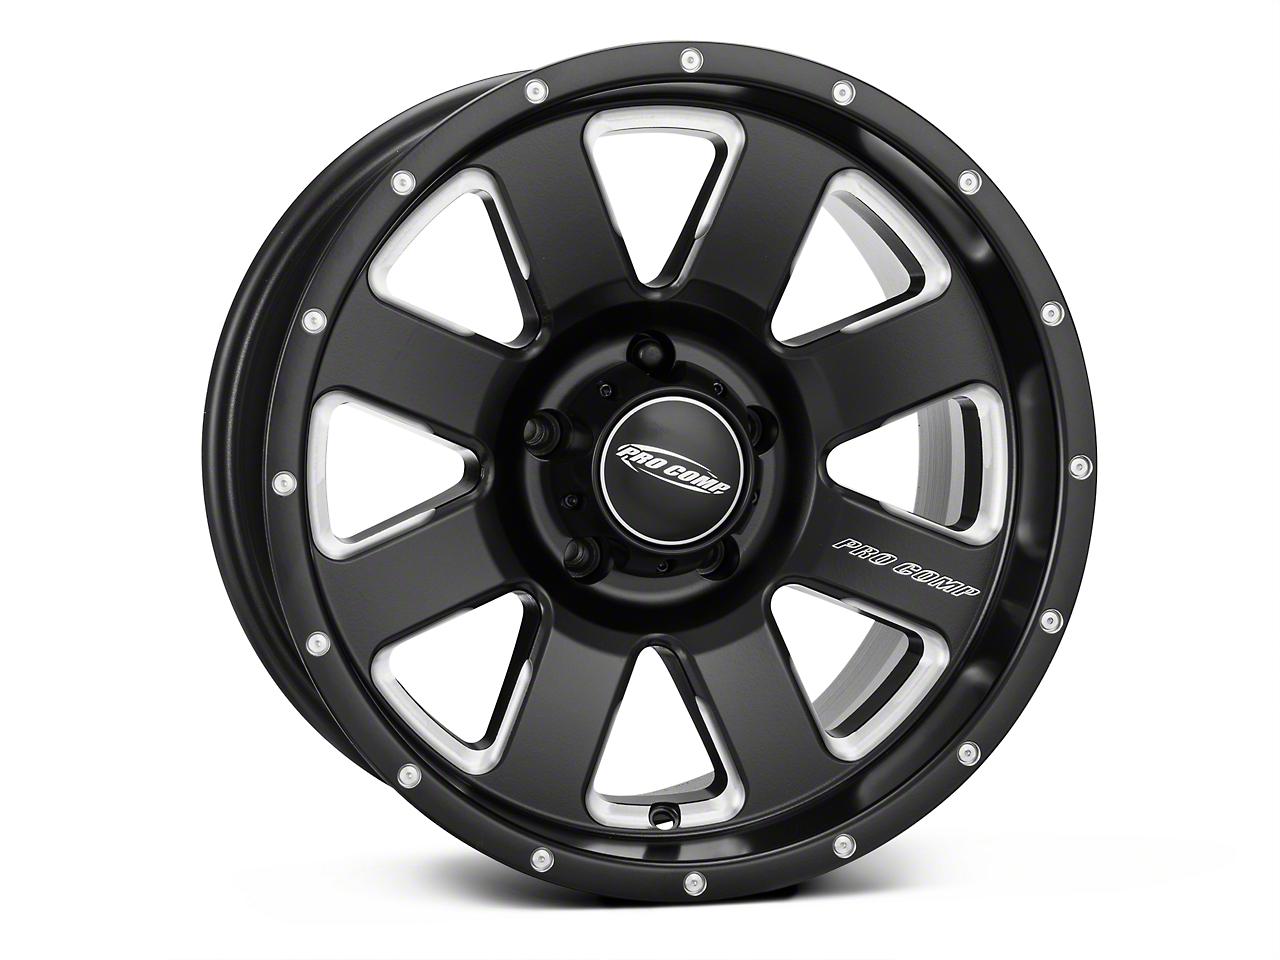 Pro Comp Alloy Series 83 Vapor Satin Black Milled Wheel - 17x9 (07-18 Wrangler JK)